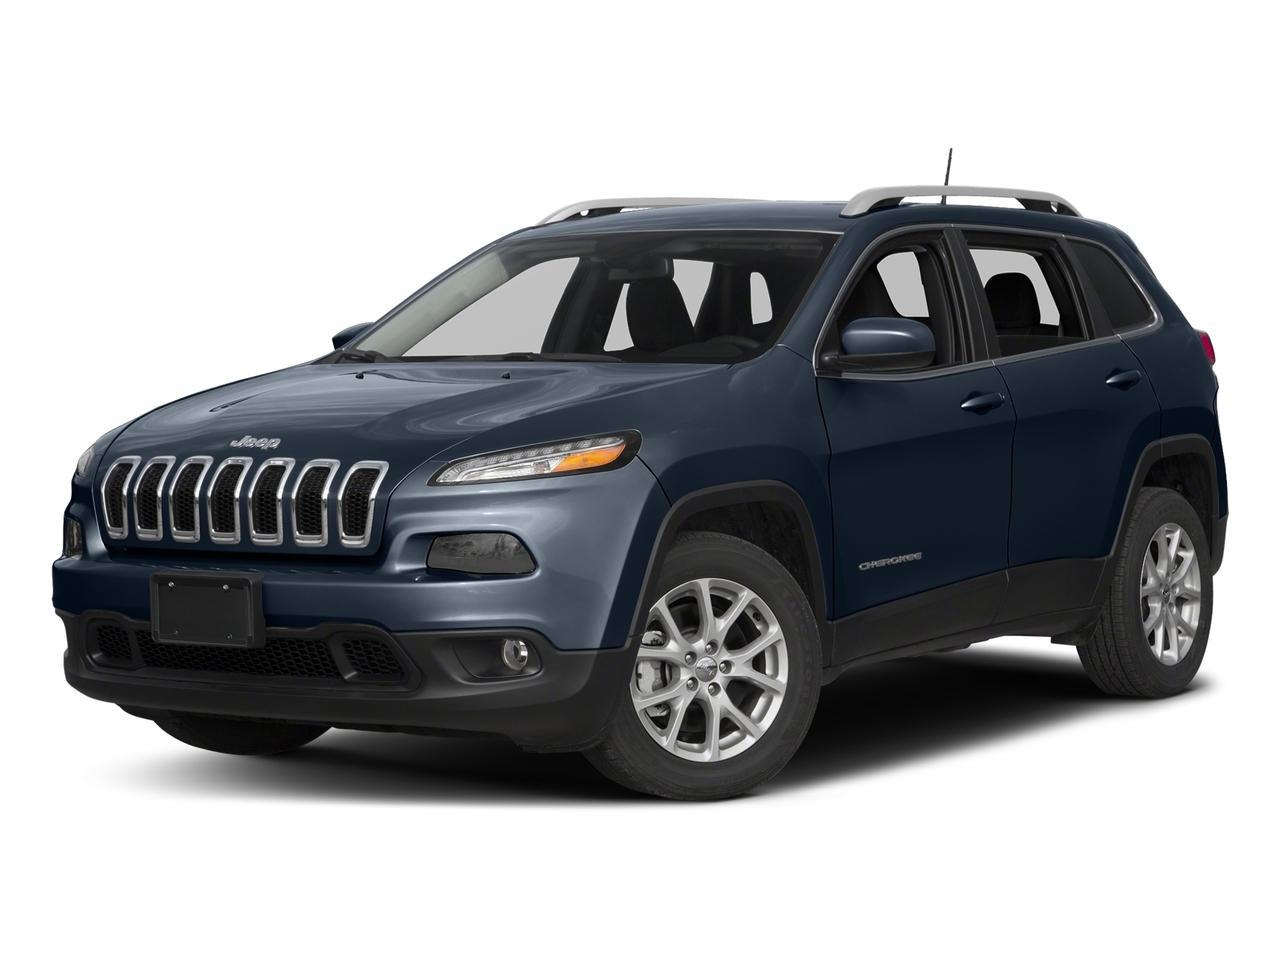 2016 Jeep Cherokee Vehicle Photo in Tulsa, OK 74133